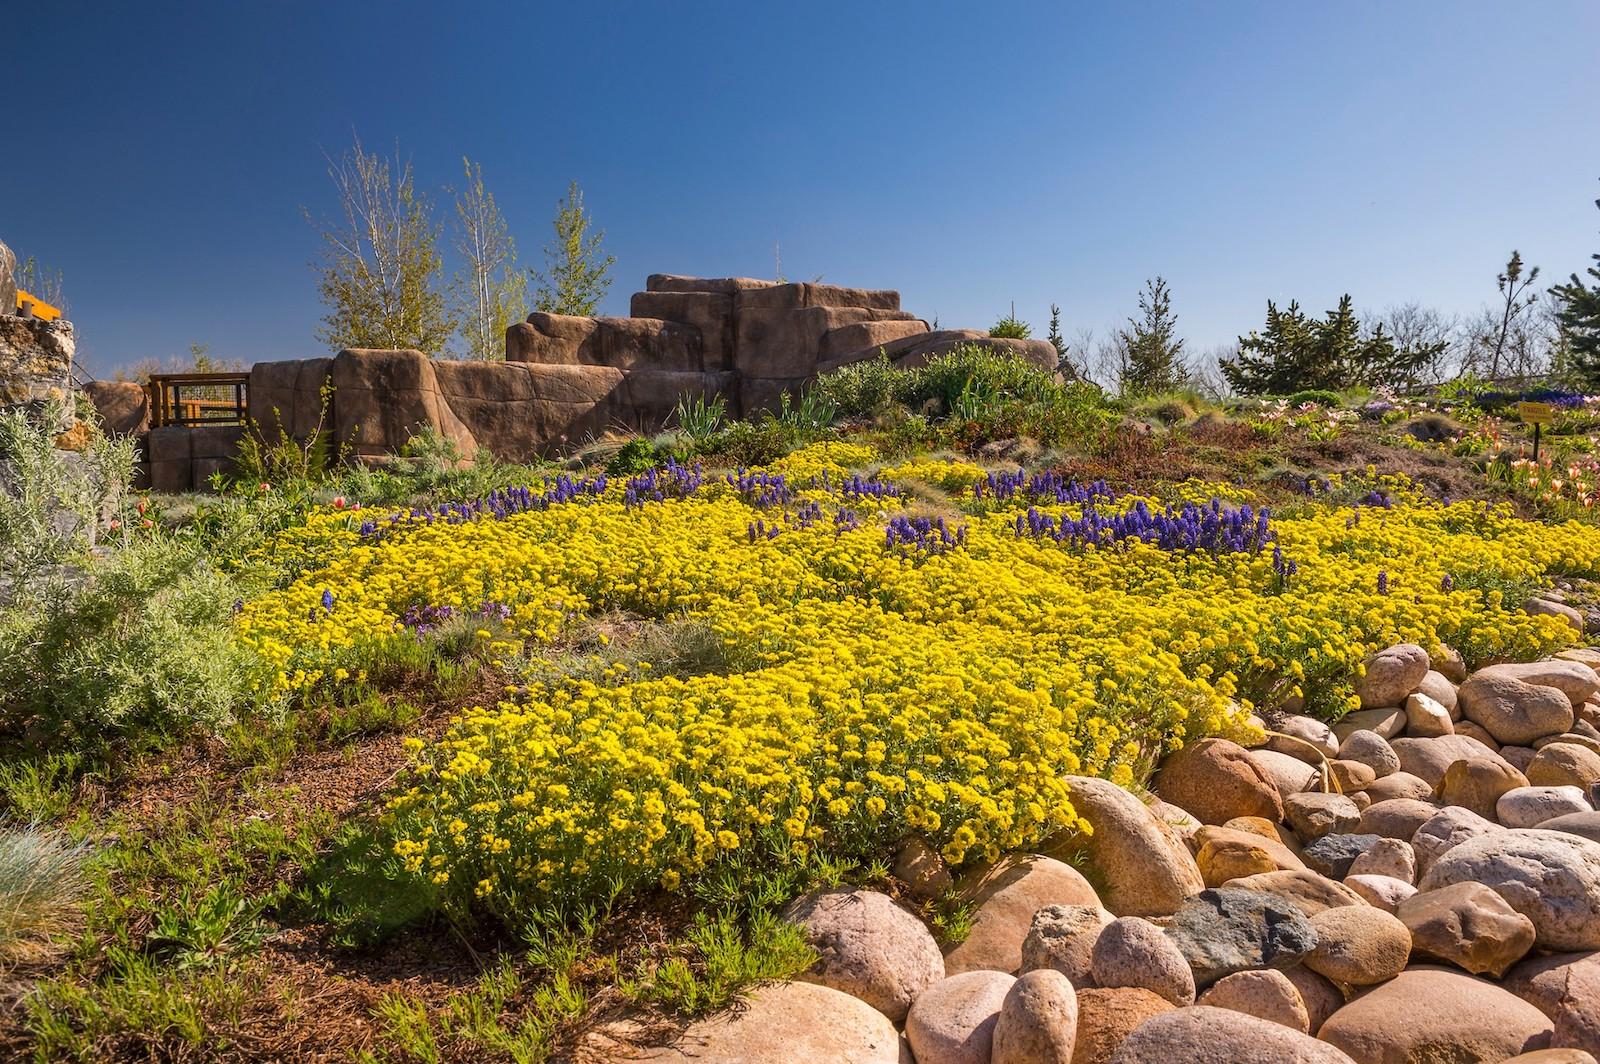 Image of flowers at the Denver Botanic Gardens